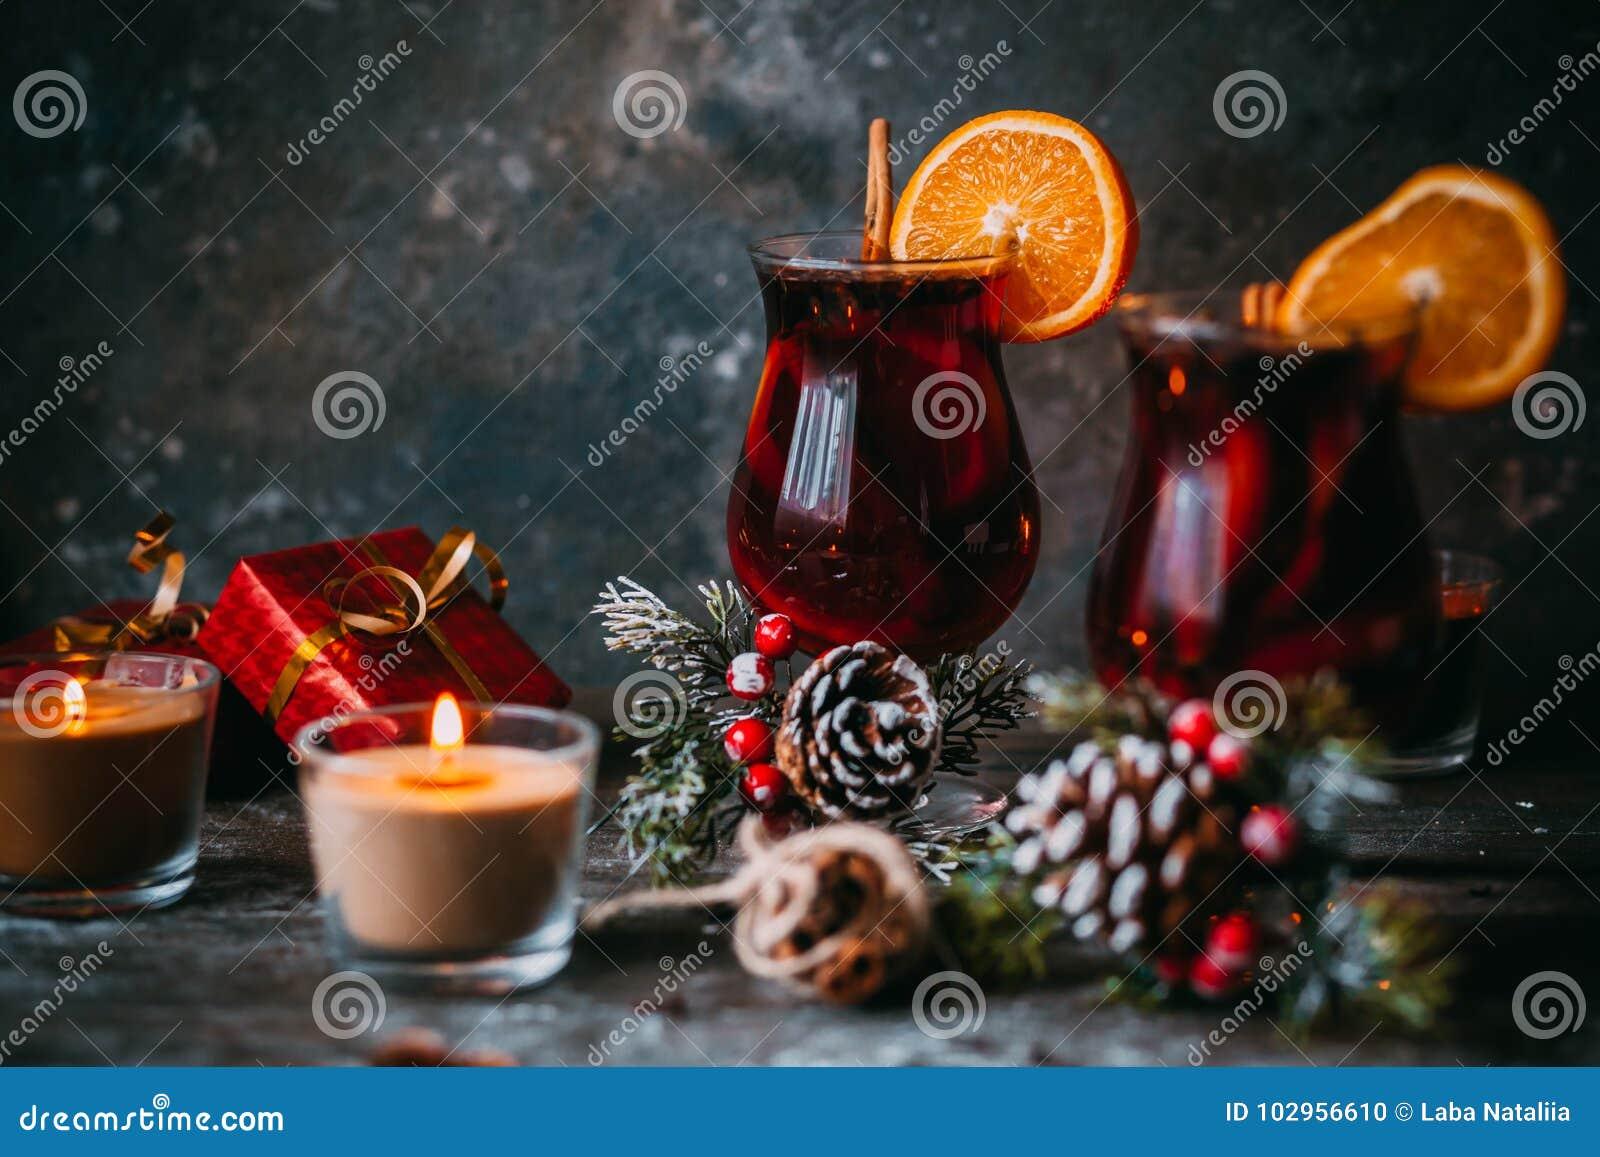 Vin brulé caldo di Natale